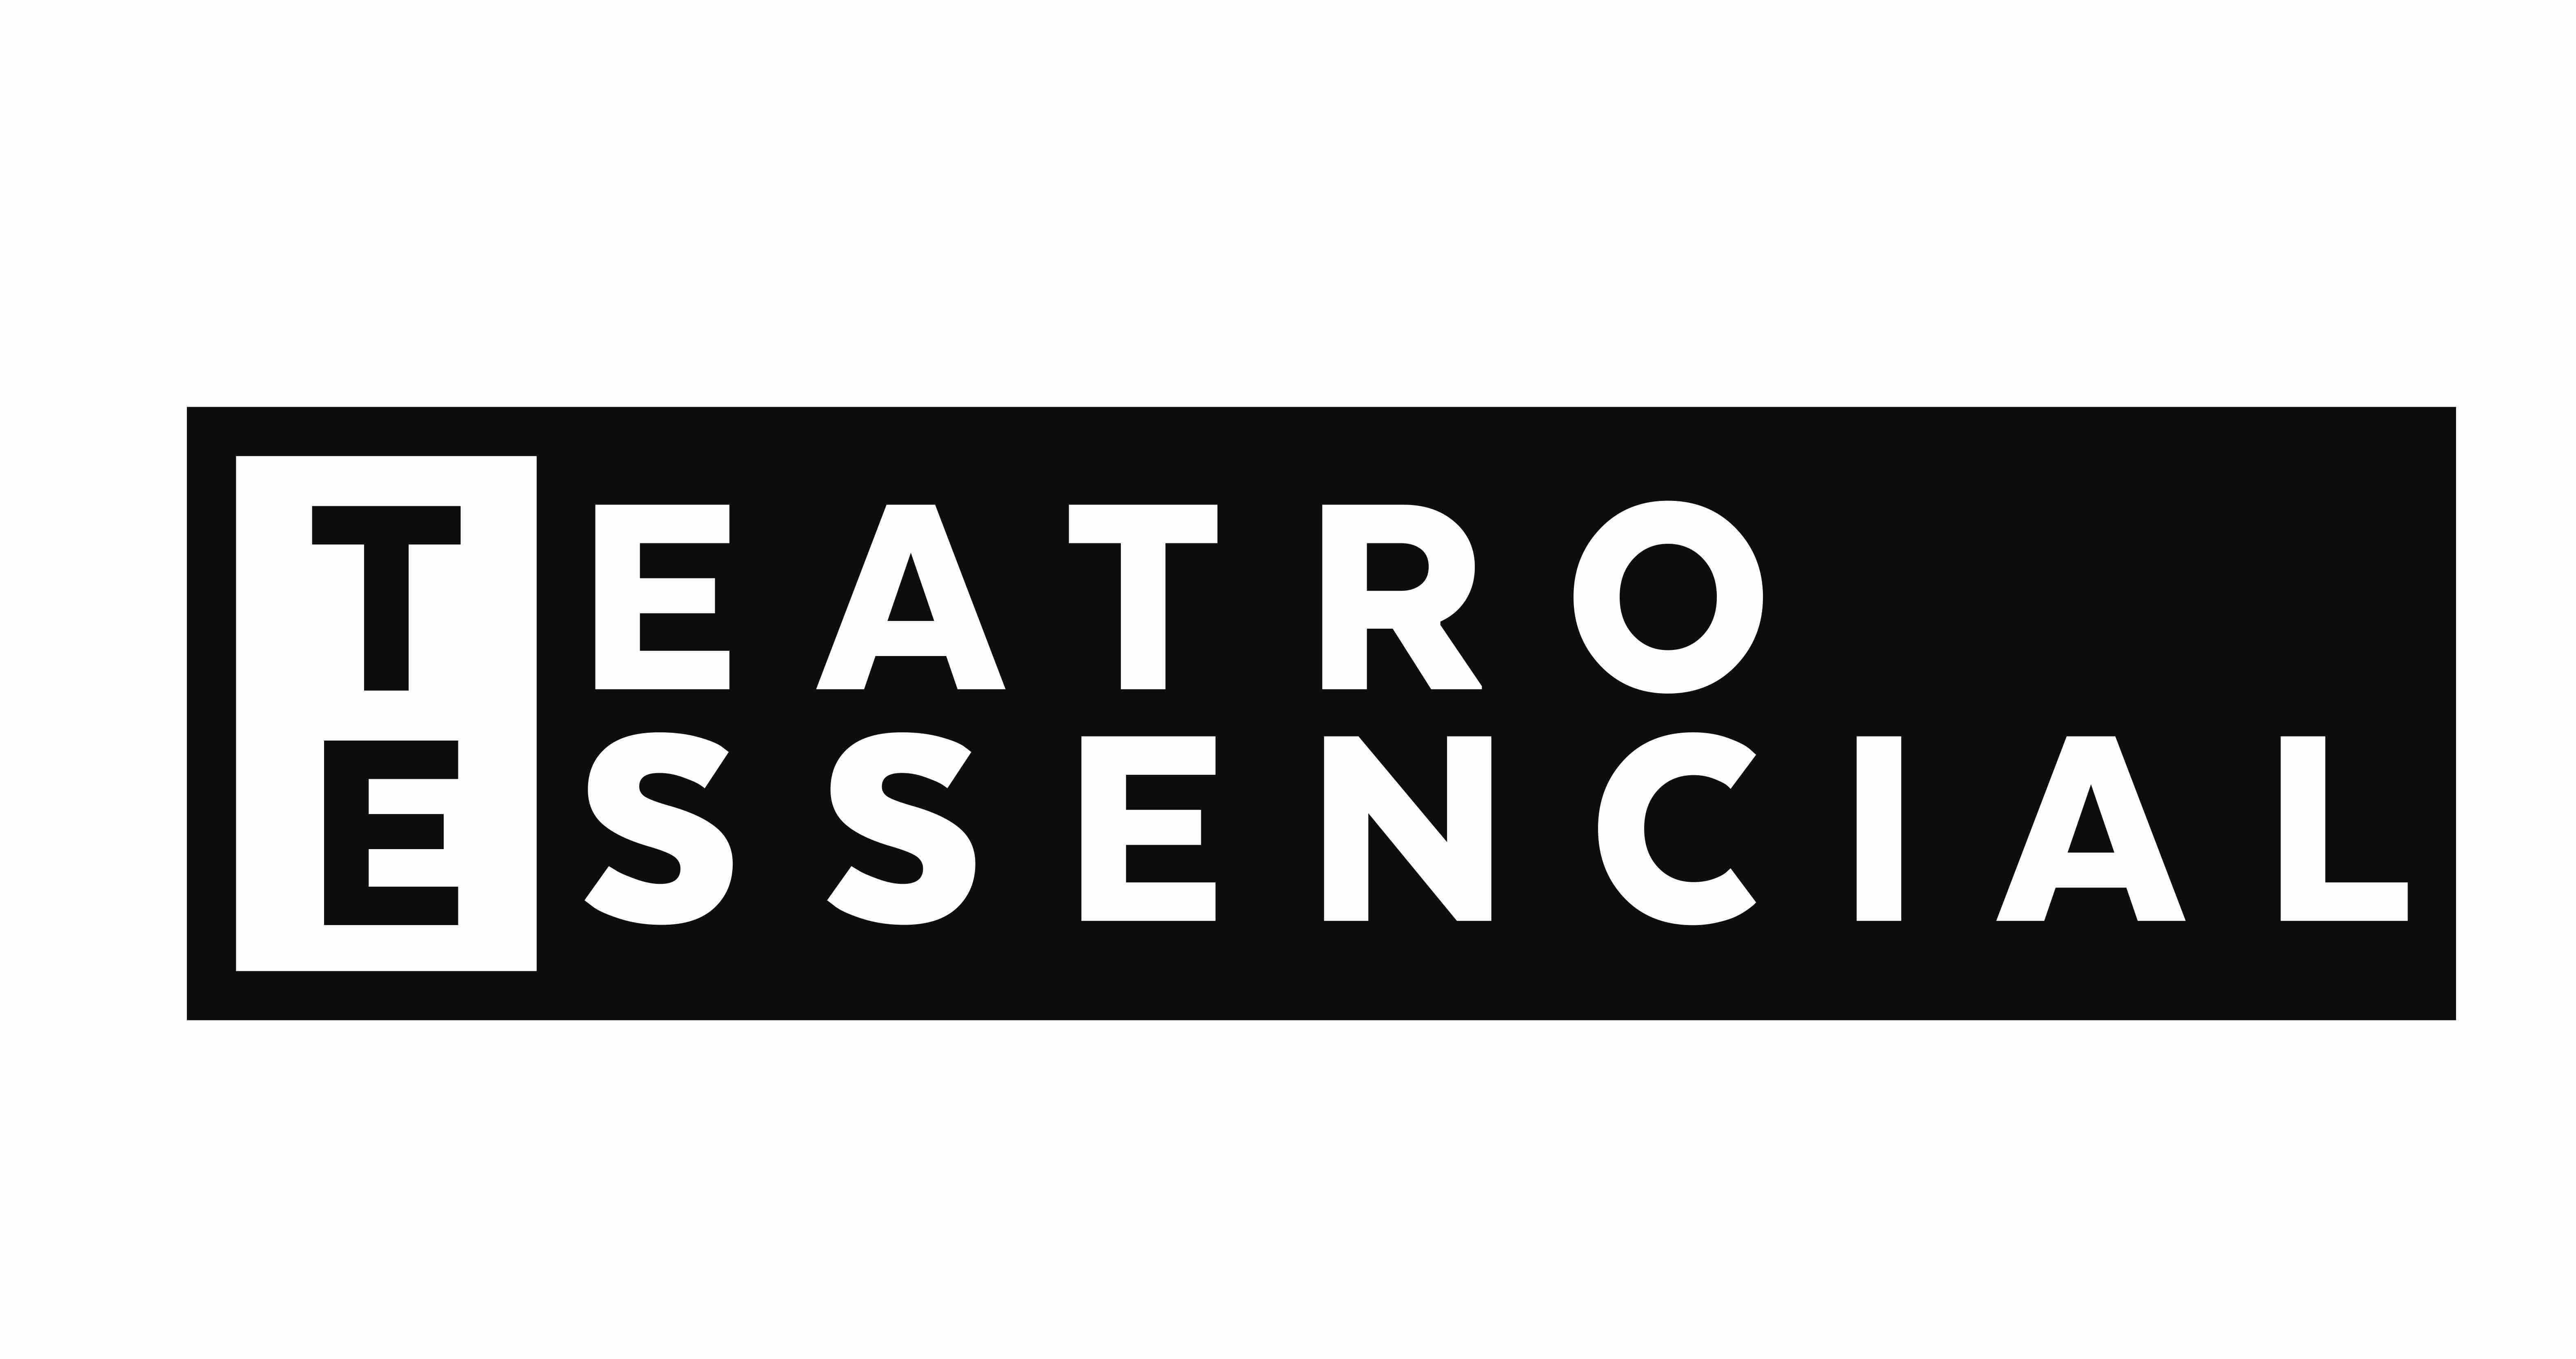 Teatro Essencial